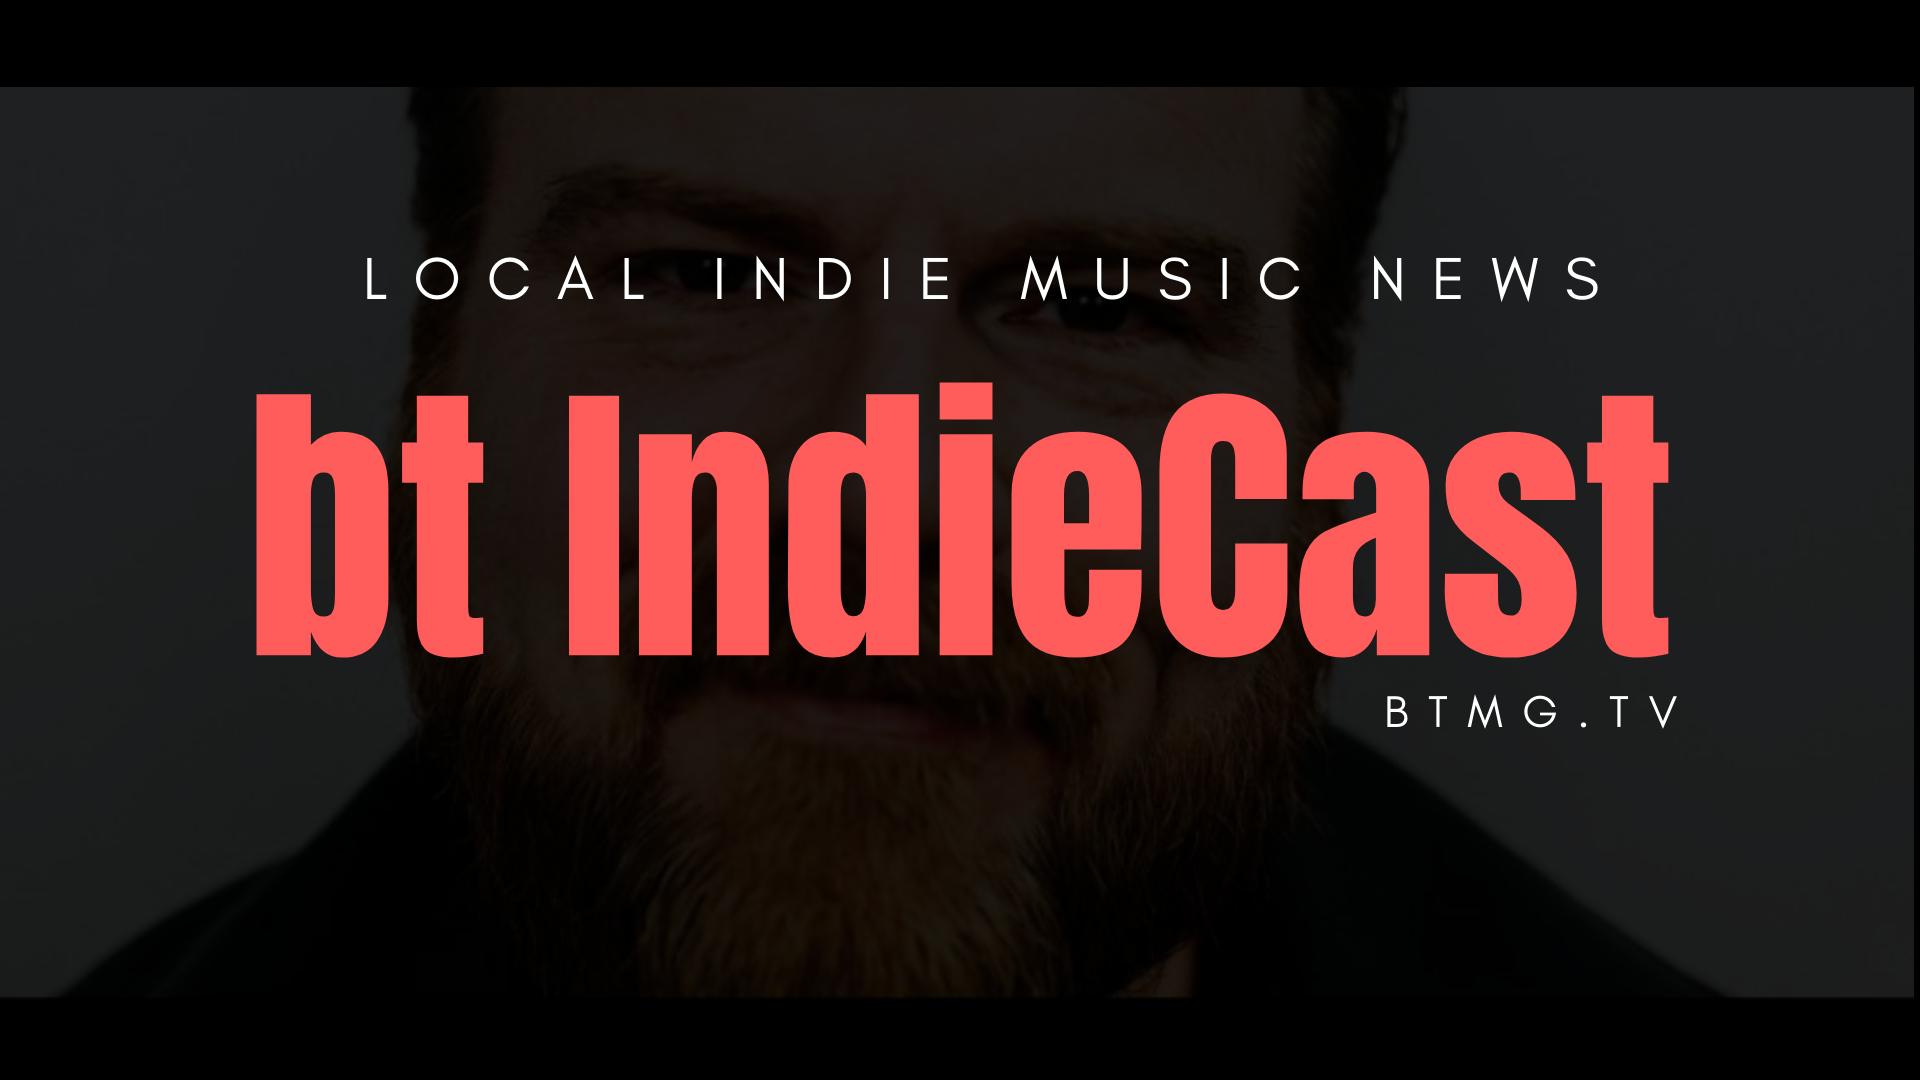 bt IndieCast 011 Meet Sean Whiting